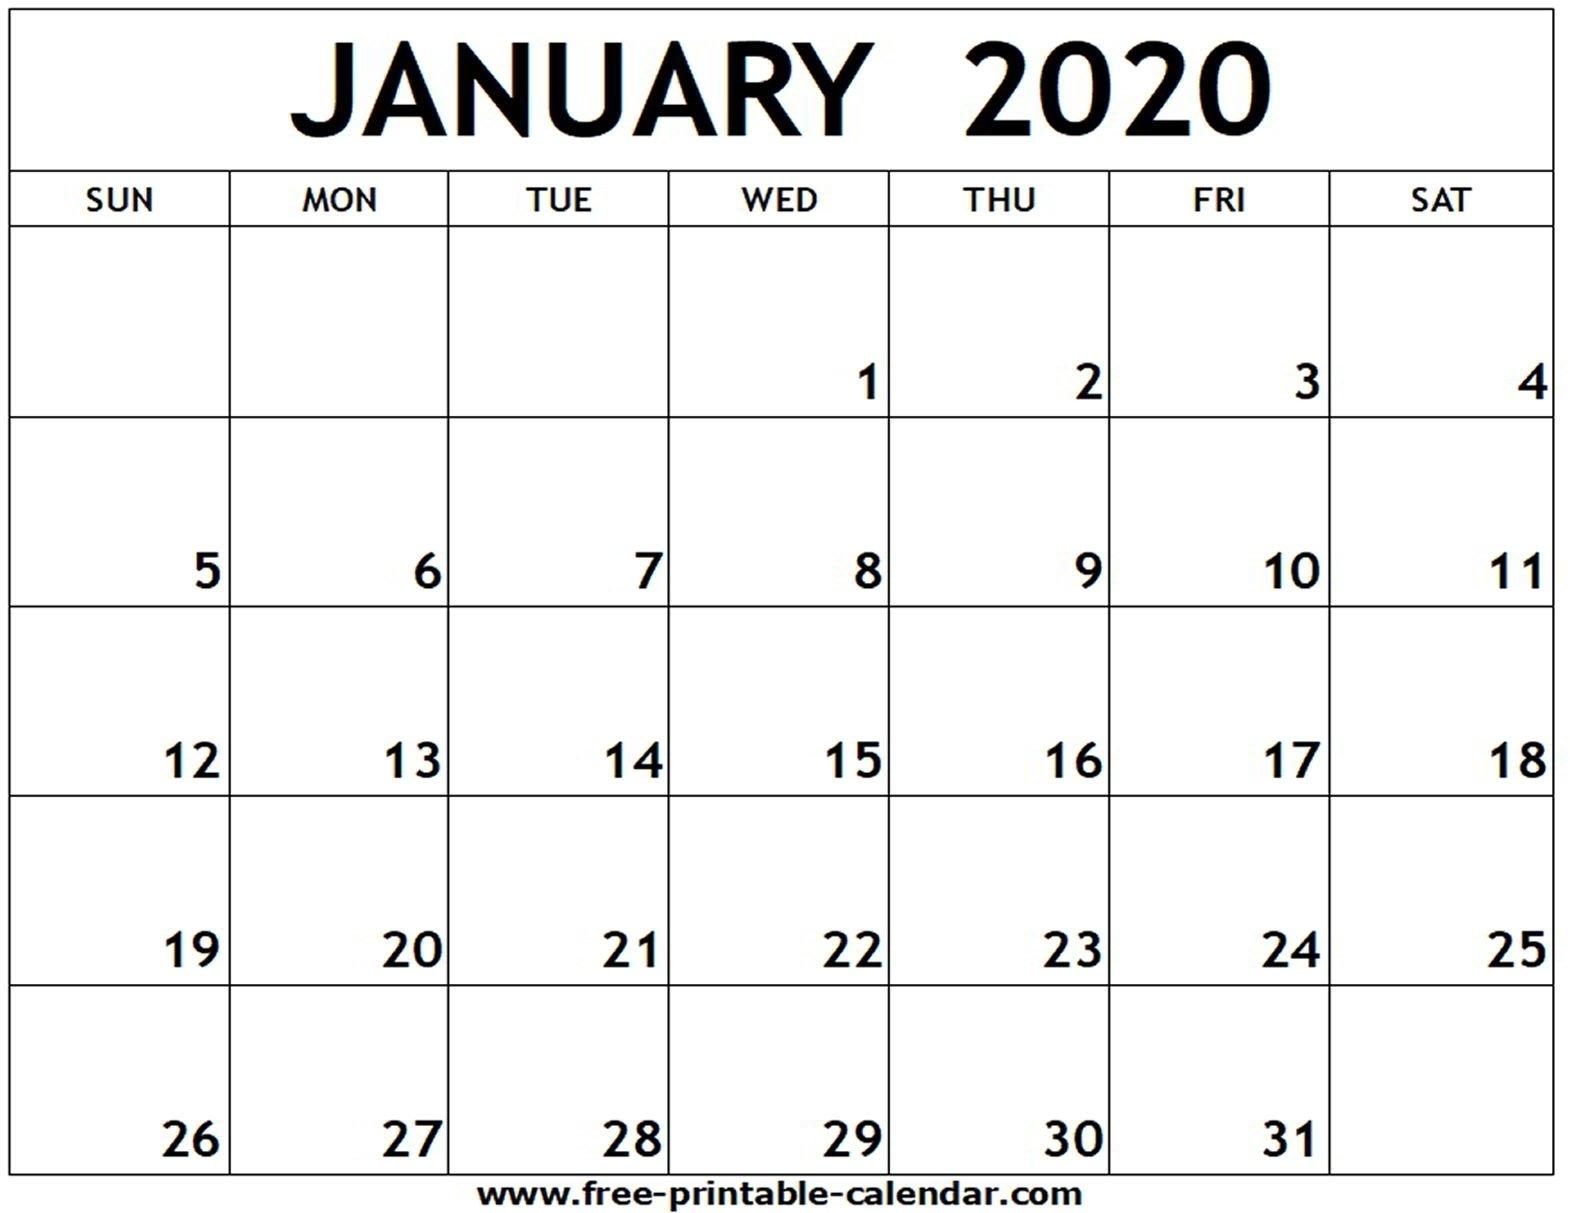 Free Printable 2020 Calendar To I Can Edit – Calendar Free Printable Calendar That I Can Edit